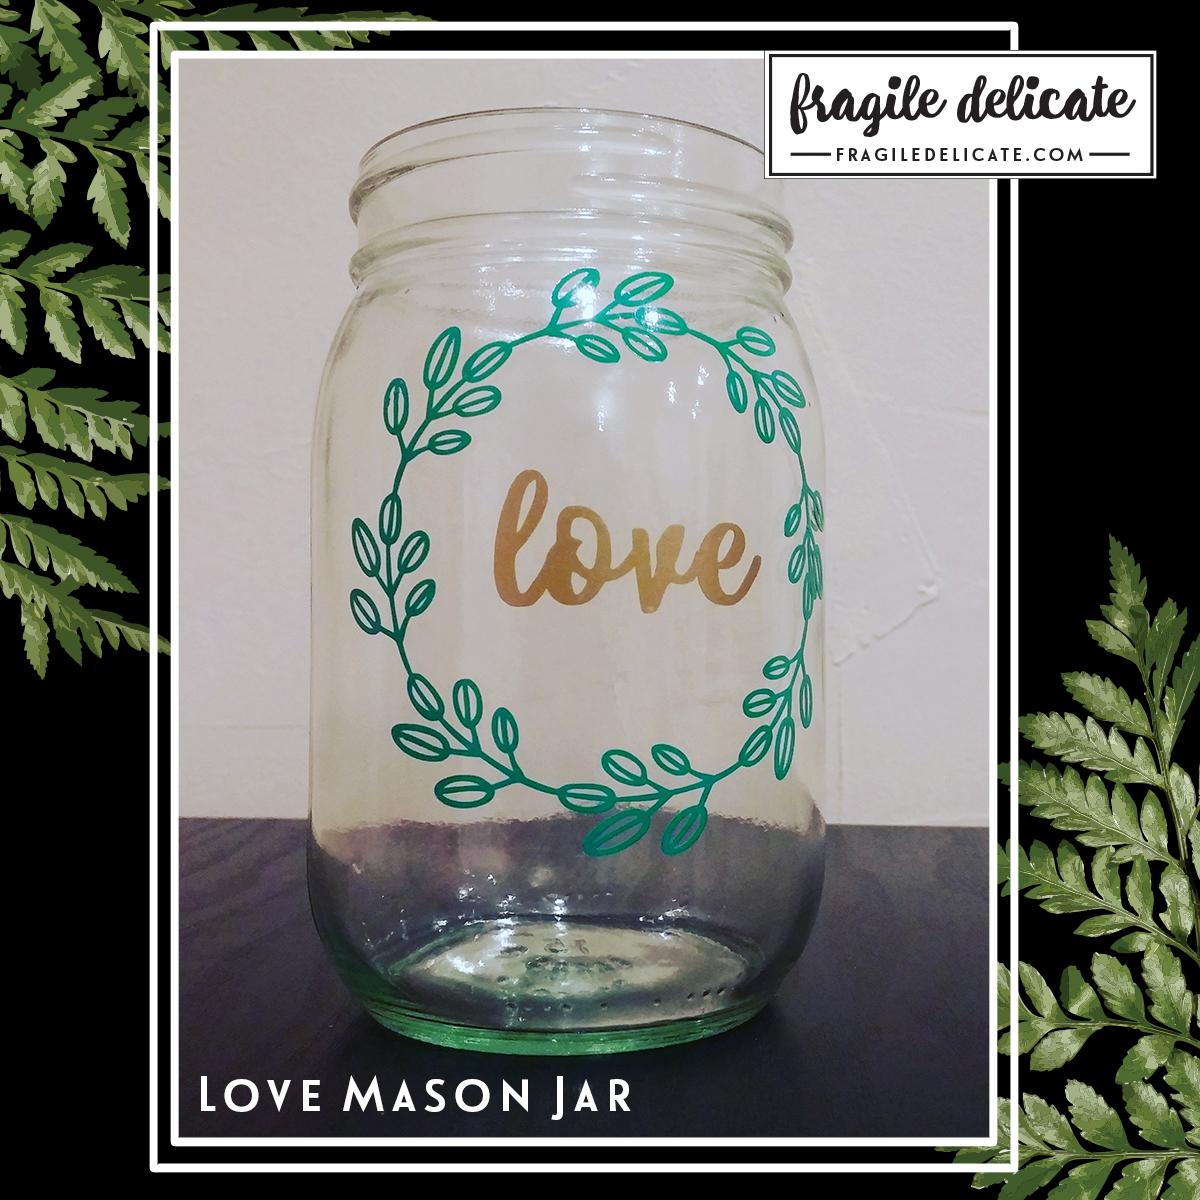 Fragile Delicate - Love Mason Jar